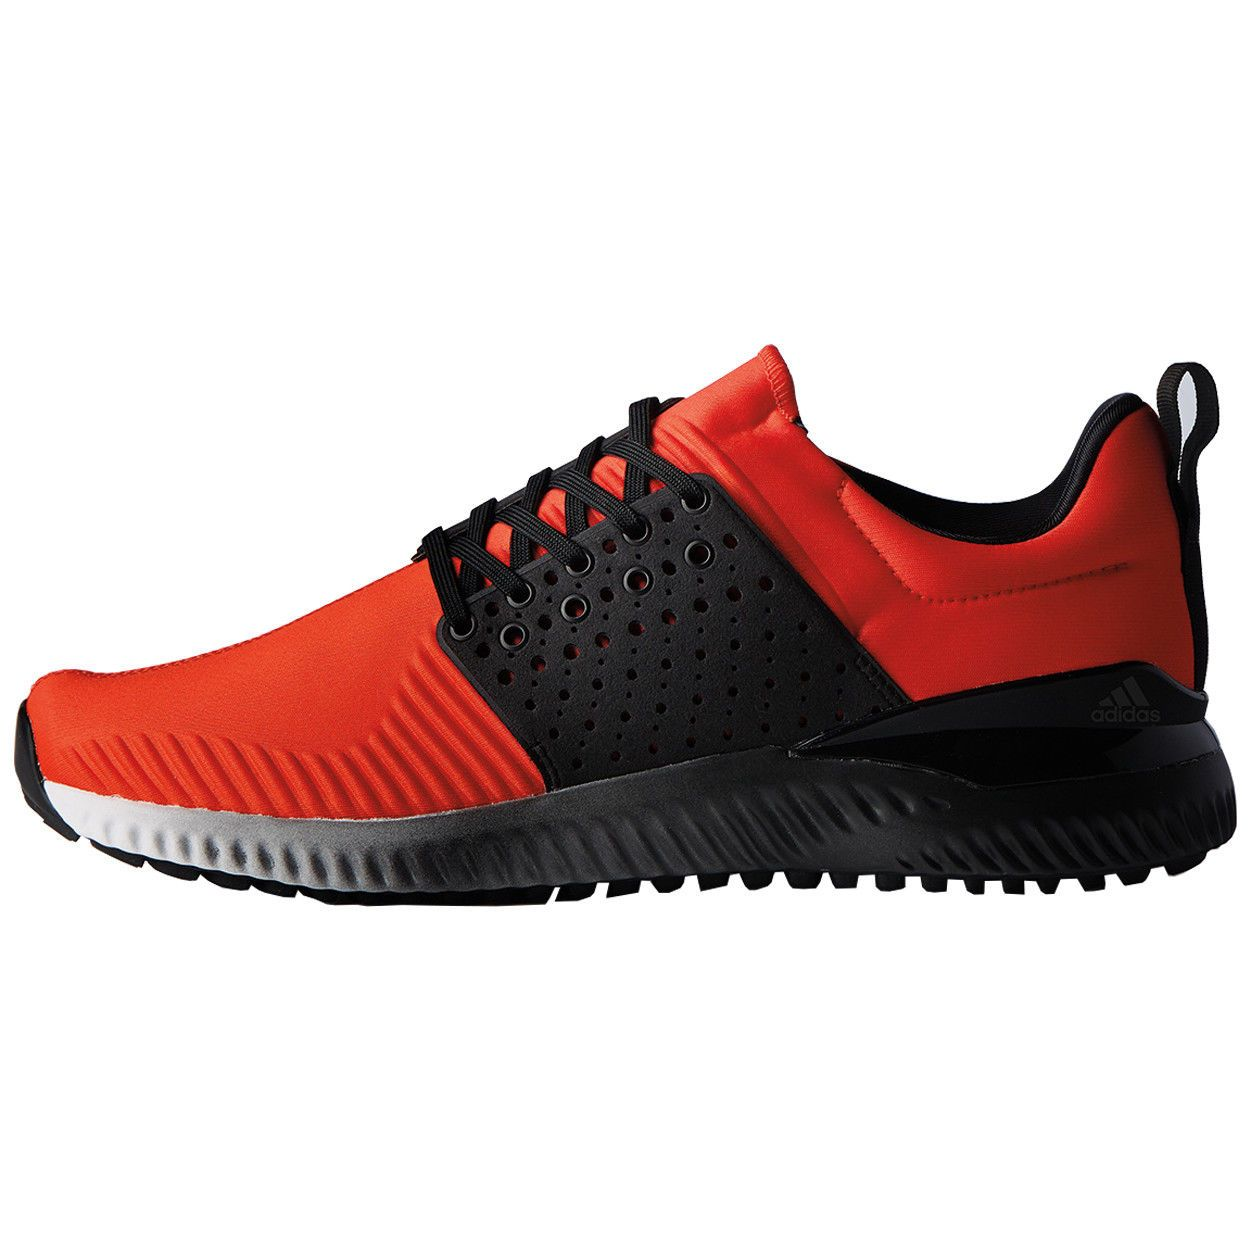 14++ Adidas adicross bounce mens golf shoes ideas in 2021